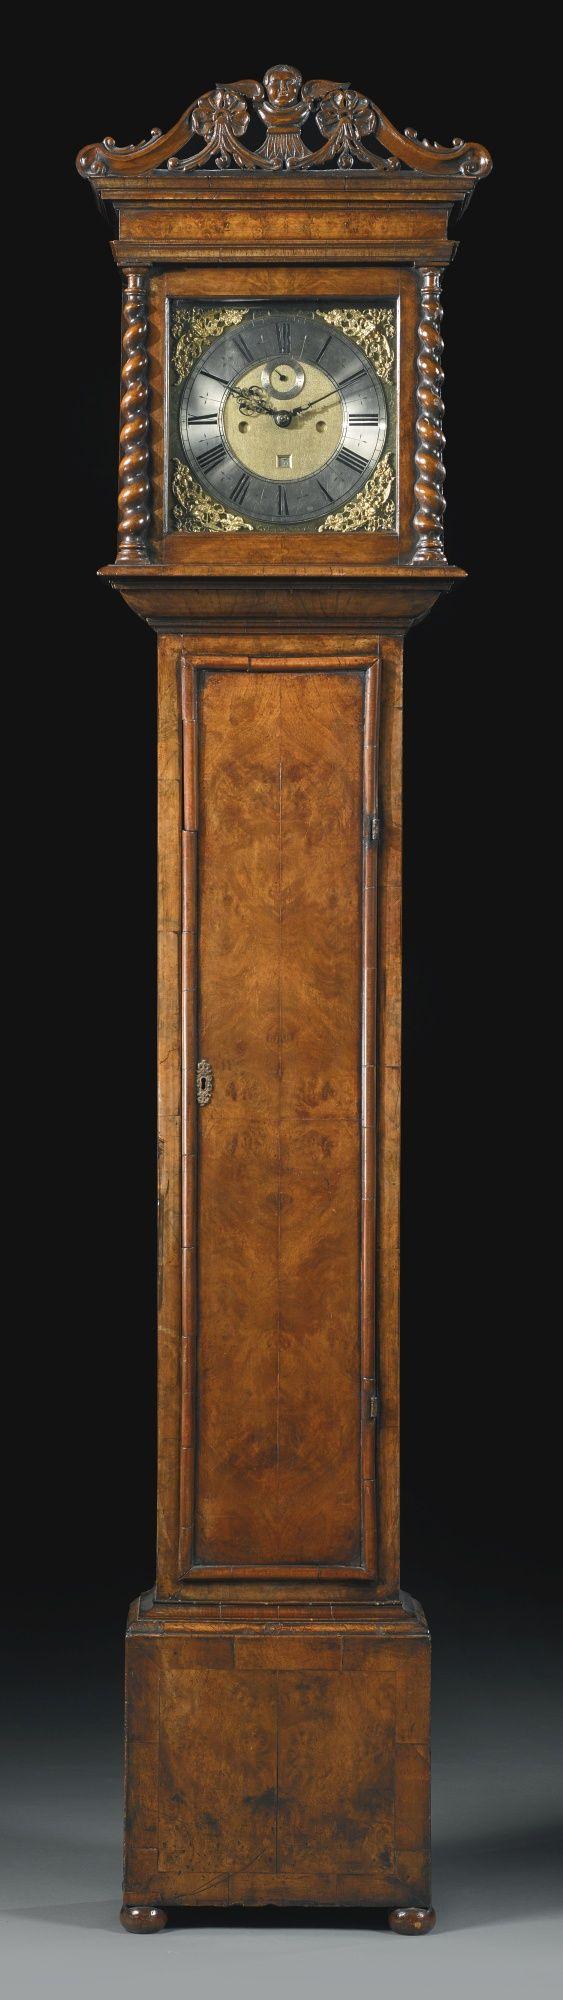 A William and Mary inlaid walnut longcase clock, Thomas Tompion<br>London, circa 1690   lot   Sotheby's